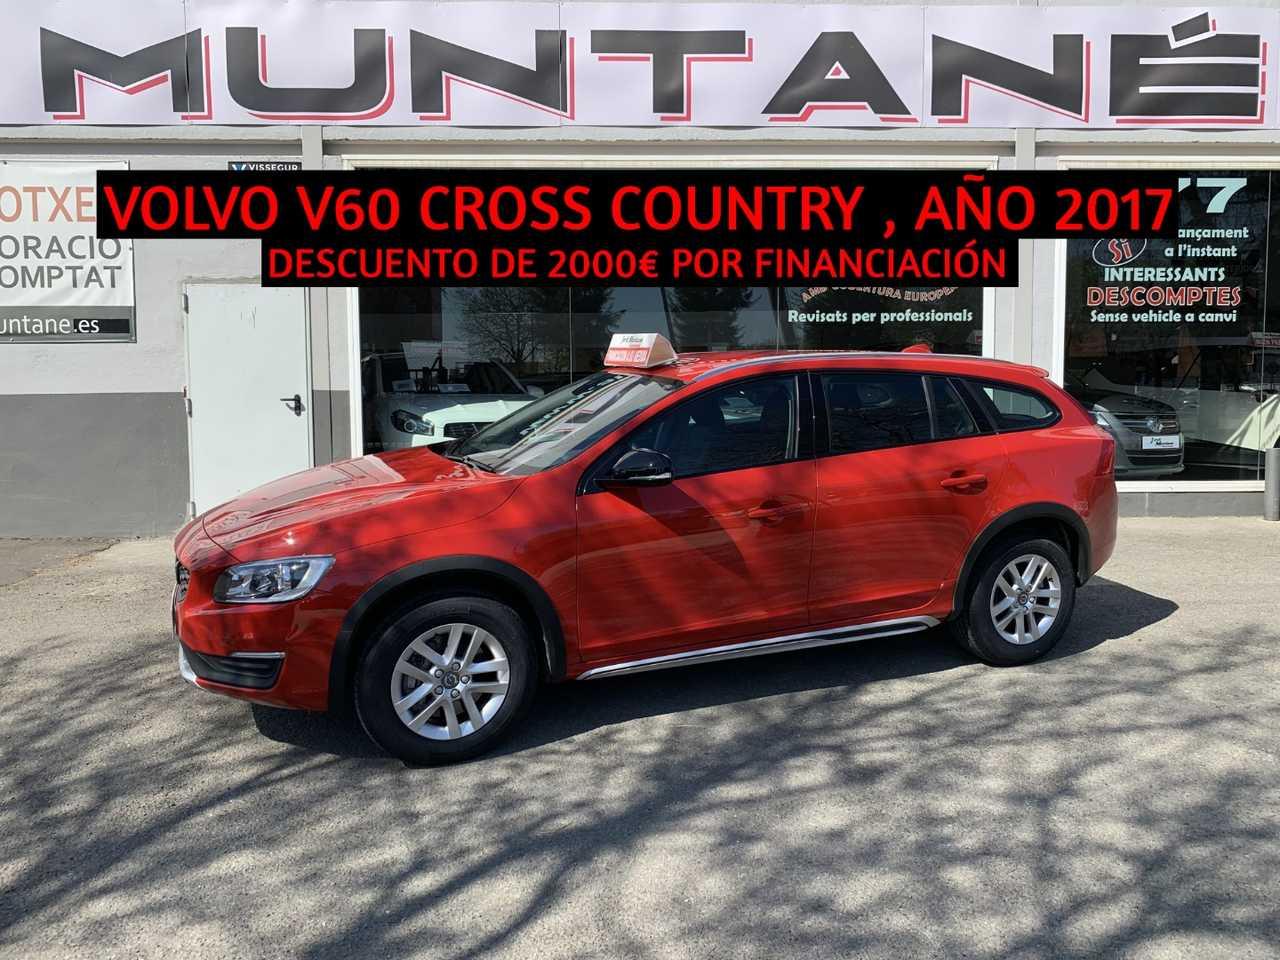 Volvo V60 Cross Country 2.0 D-3 150cv -. '' Cross Country '' .- Muy Equipado -.   - Foto 1